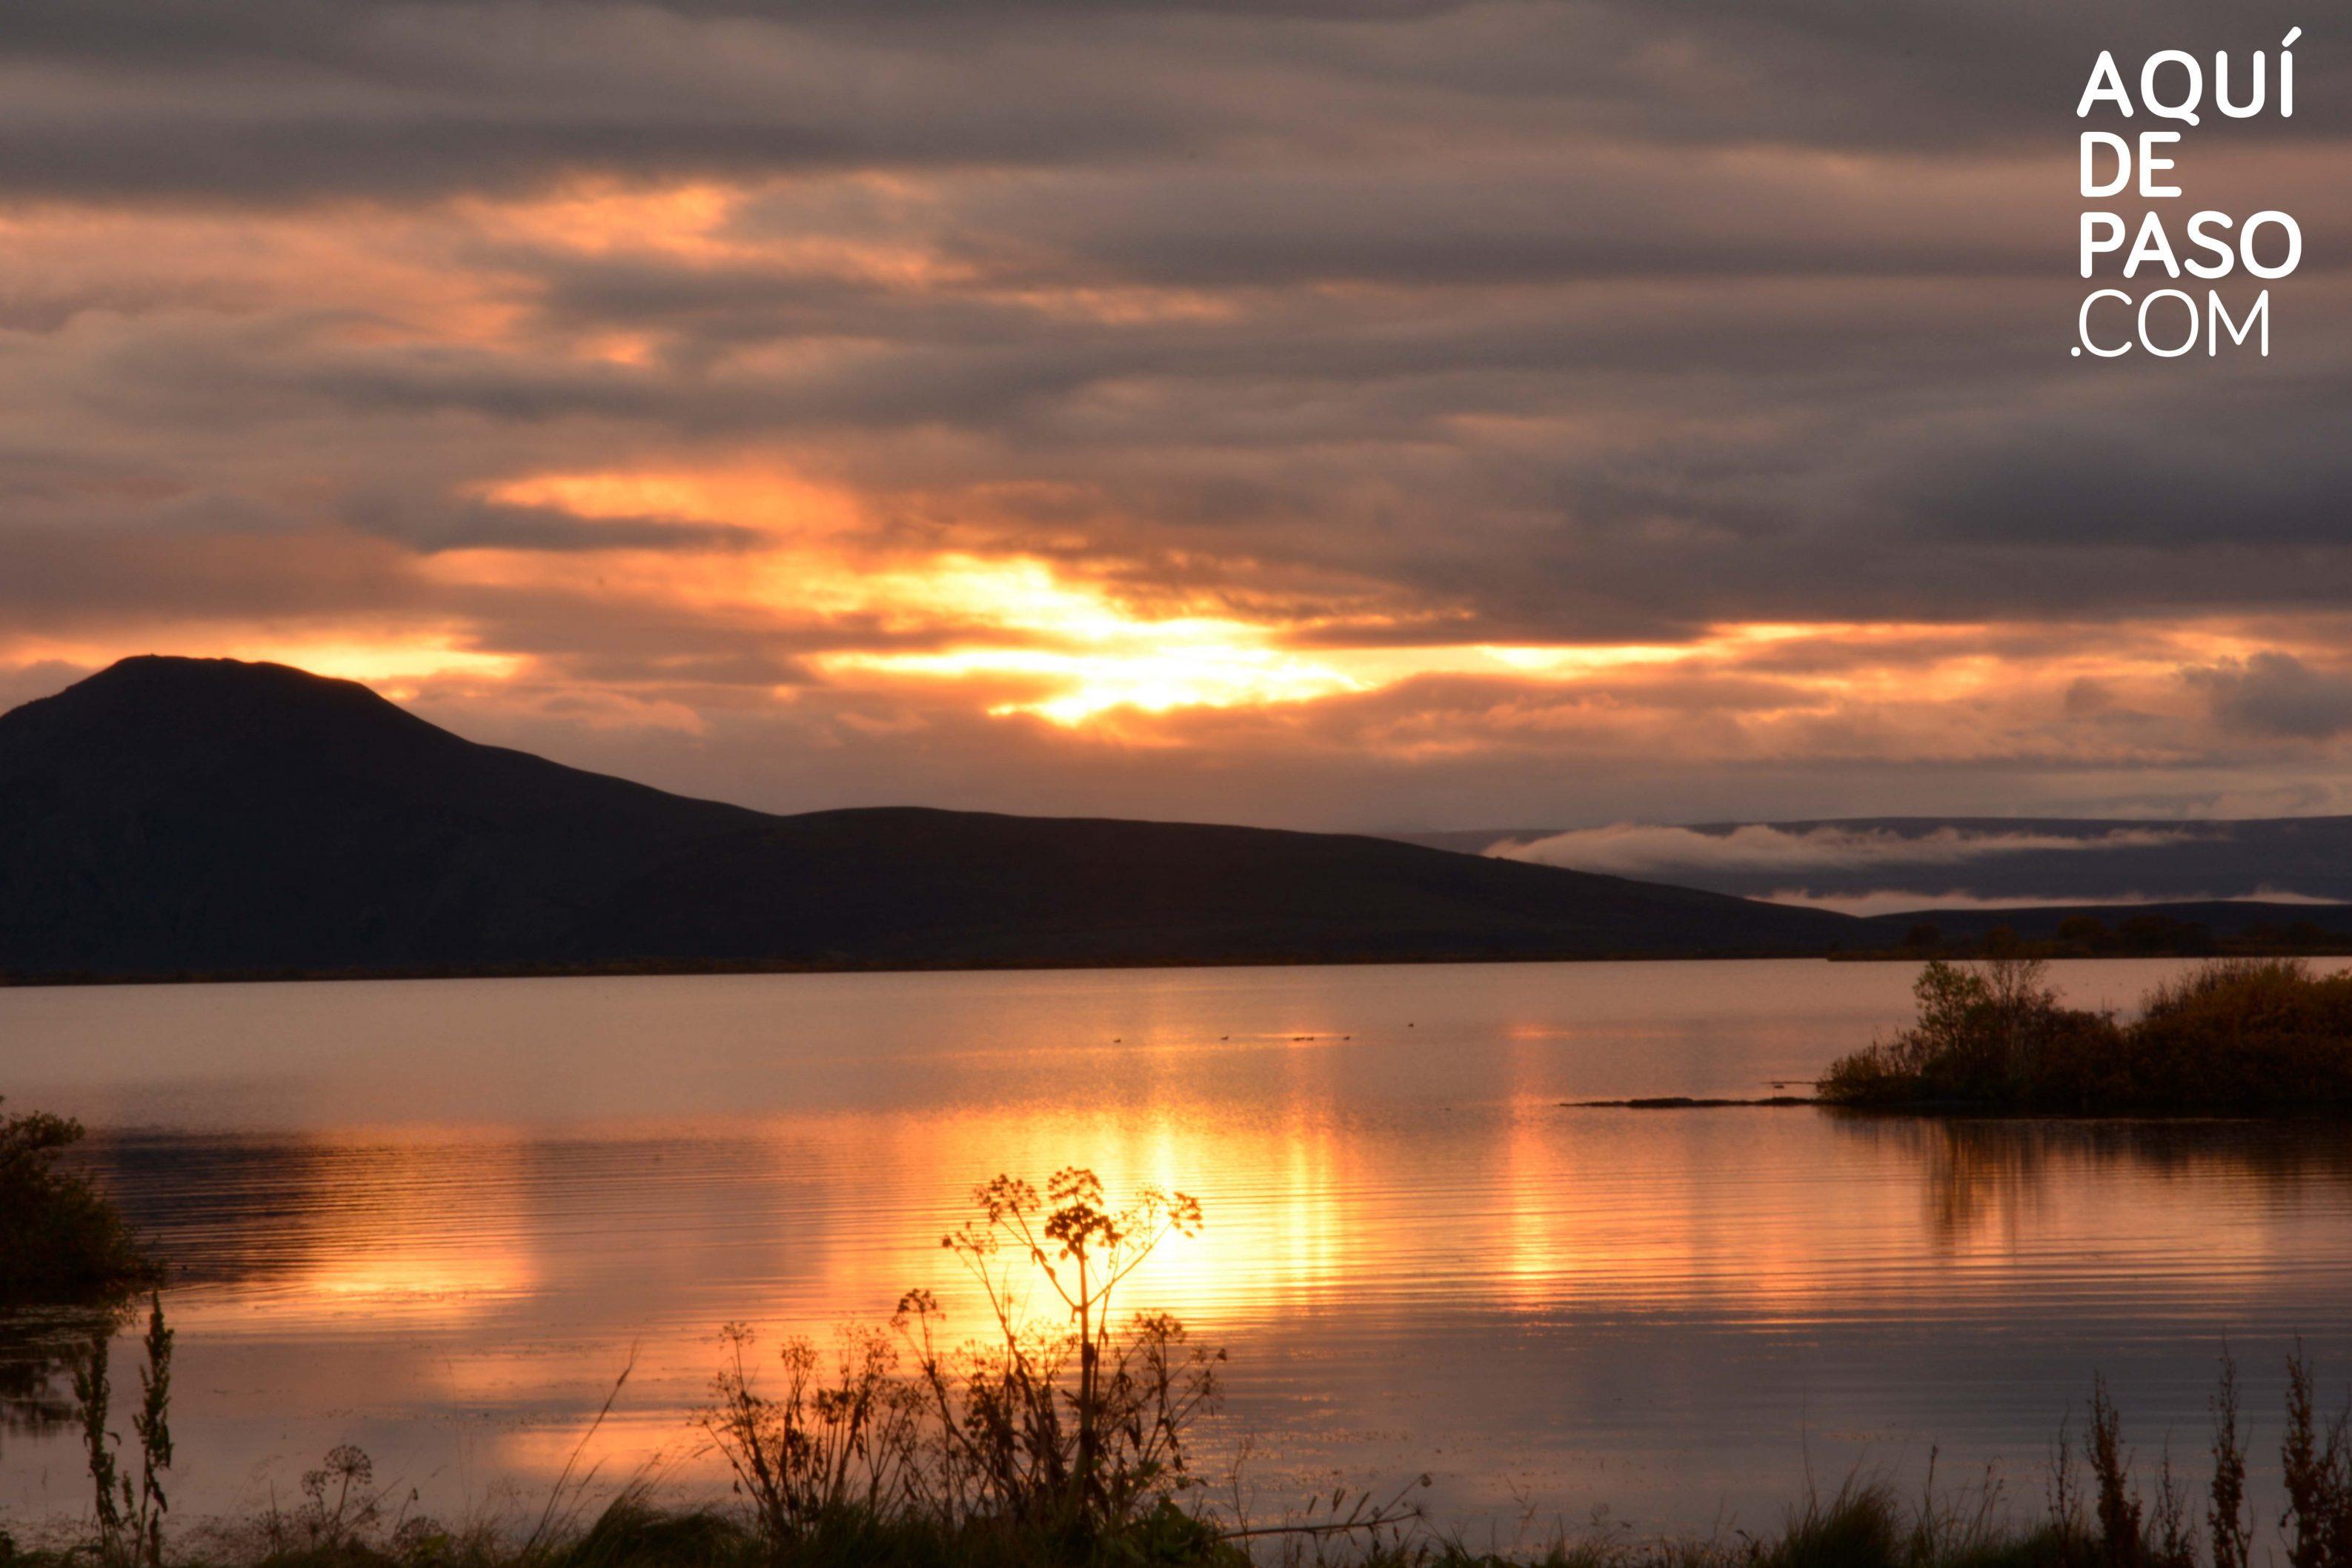 Lago Mytvan - Aquidepaso.com